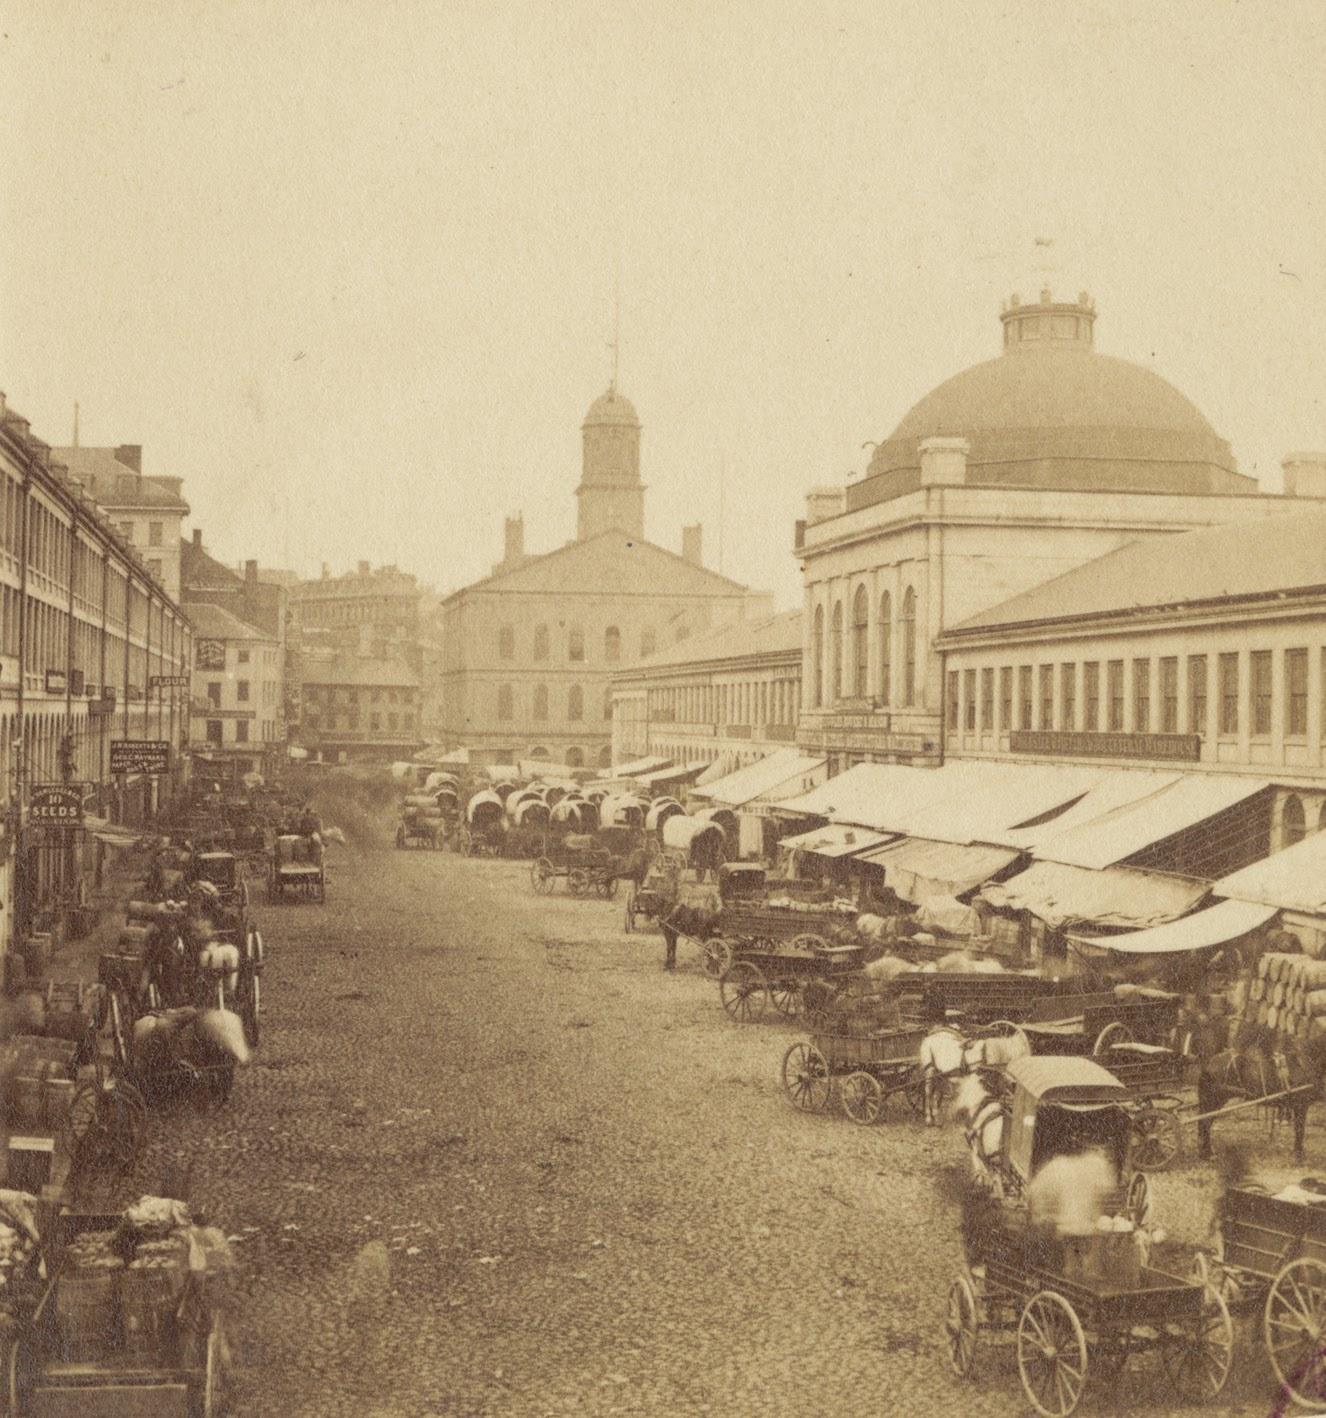 1800 S Colonial Scene On Demand: The Scene In 2014: